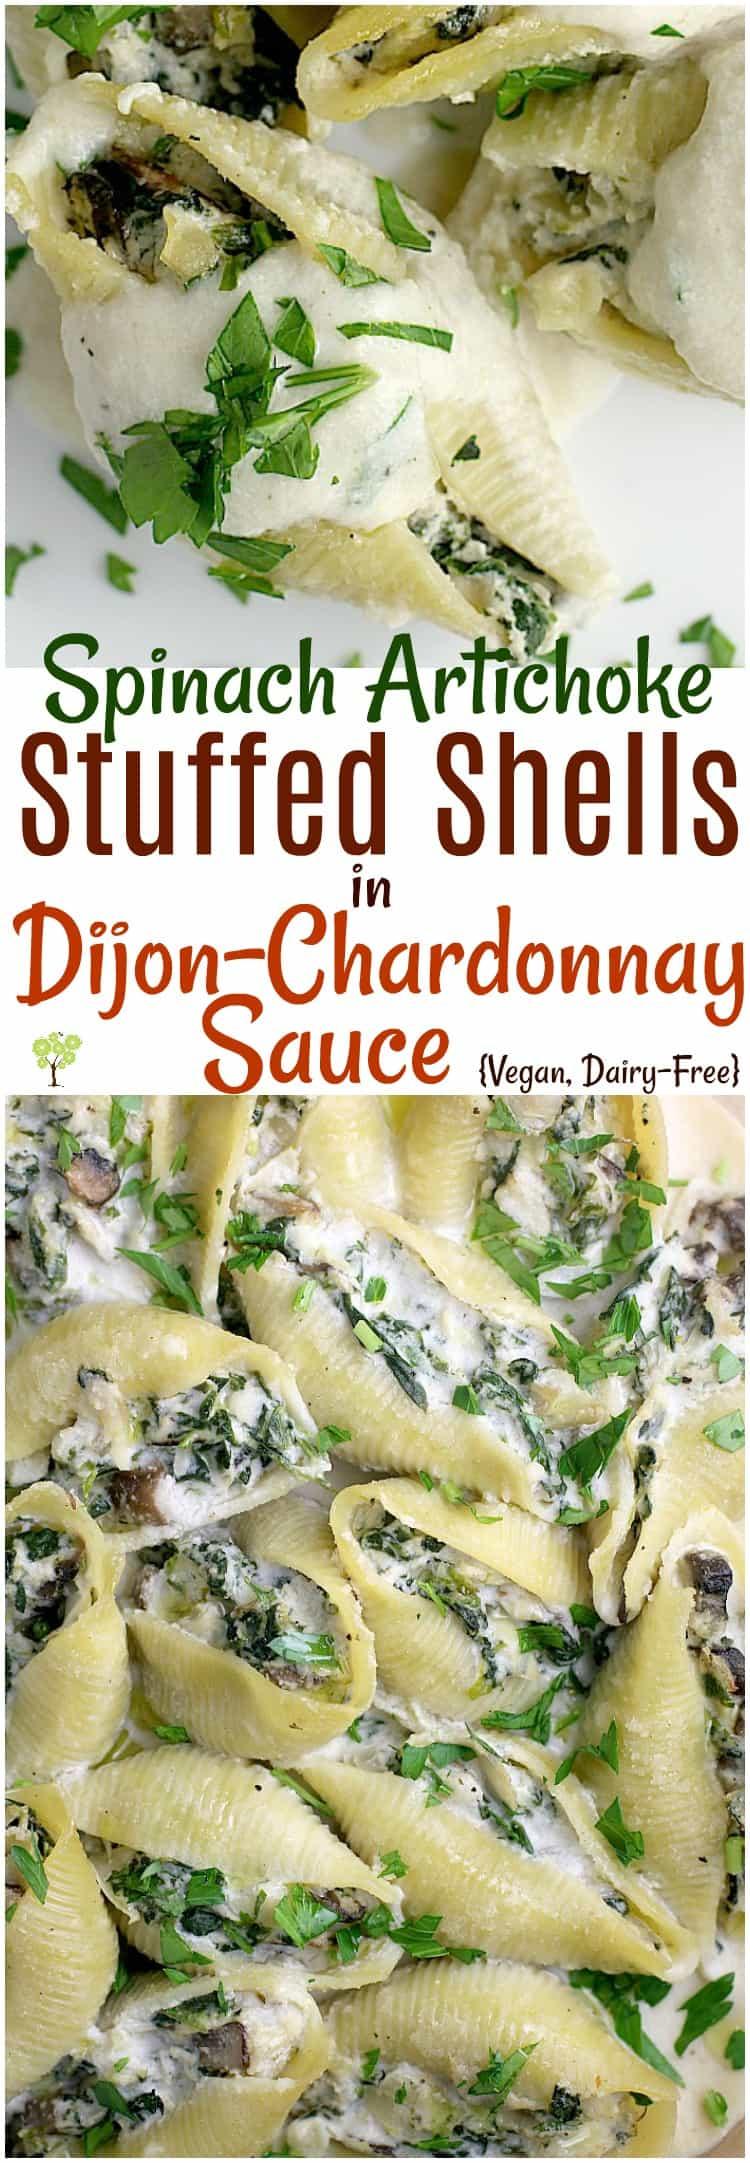 Spinach Artichoke Stuffed Shells in Dijon-Chardonnay Sauce